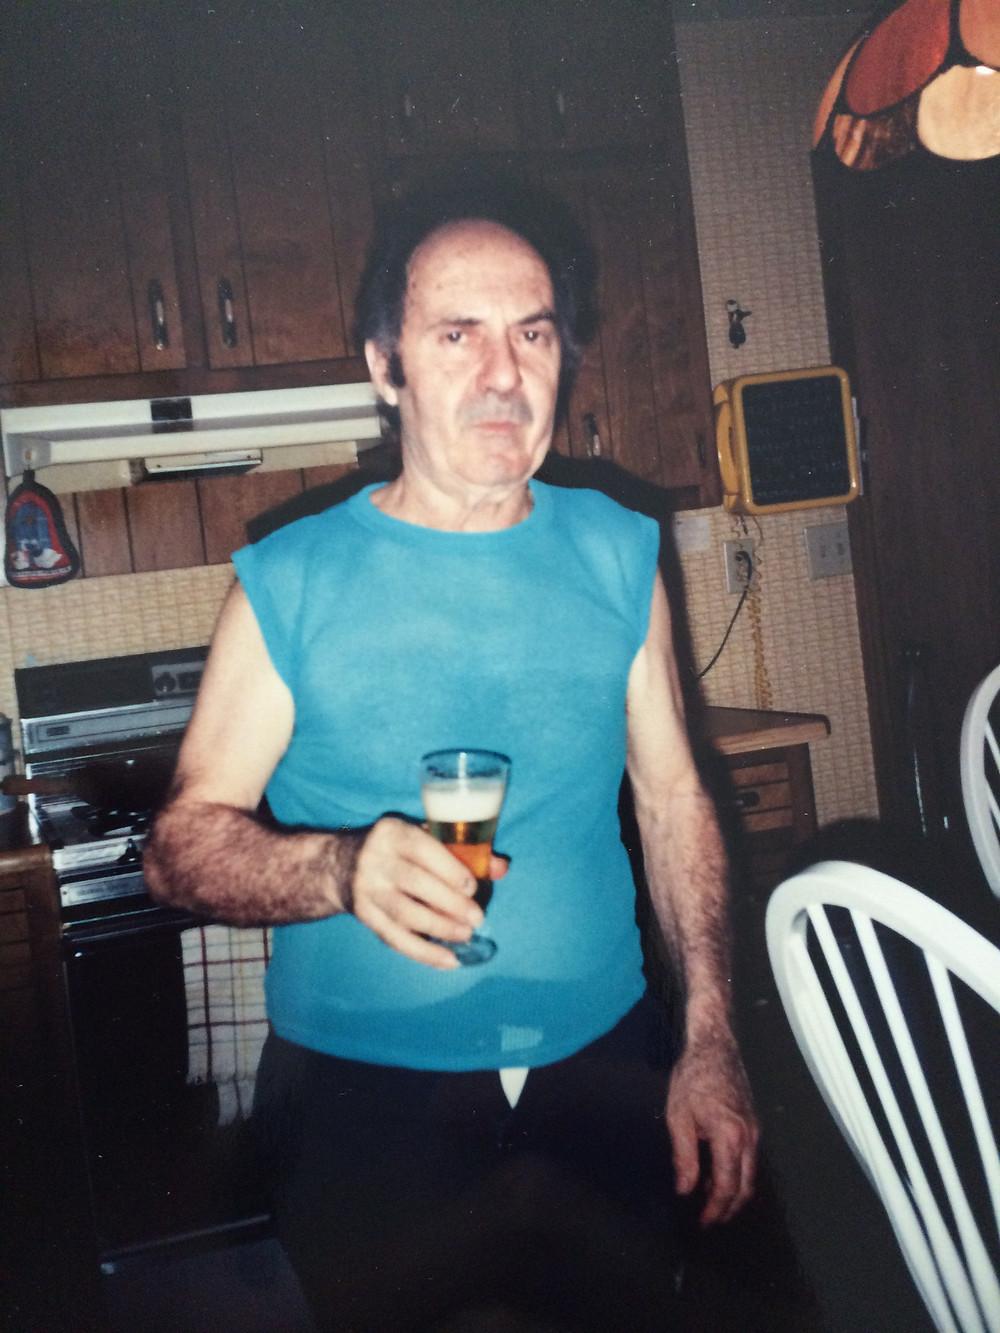 My grandpa, Tito, in utter badassery mode <3